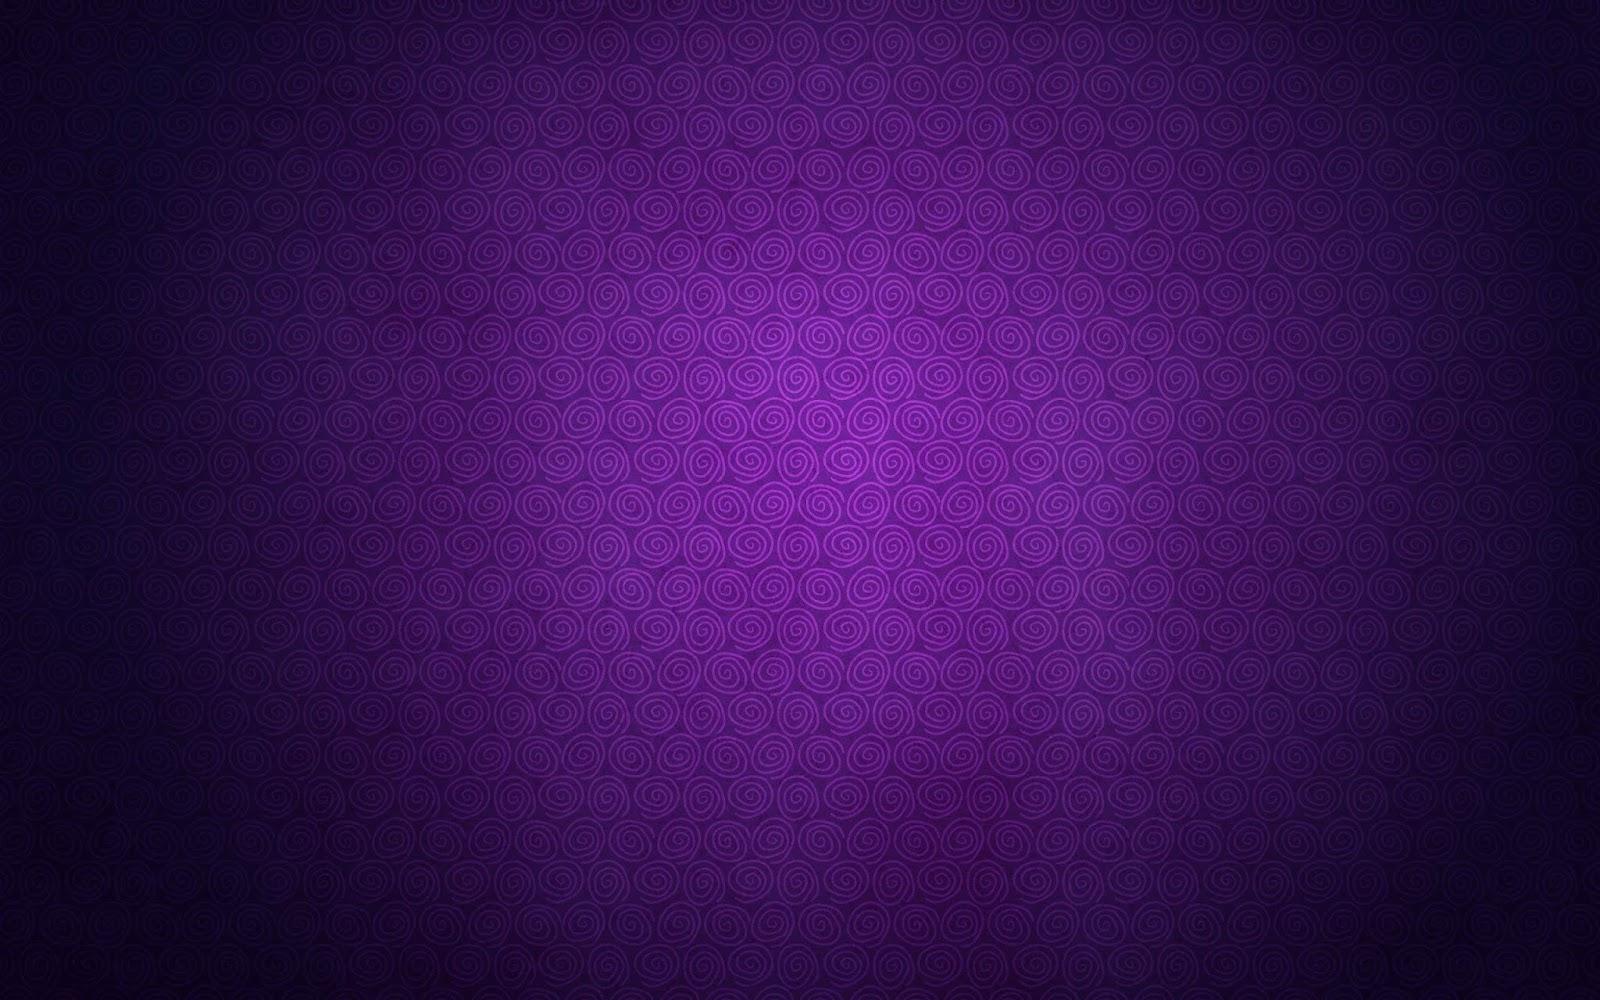 Lilac purple wallpaper 2017